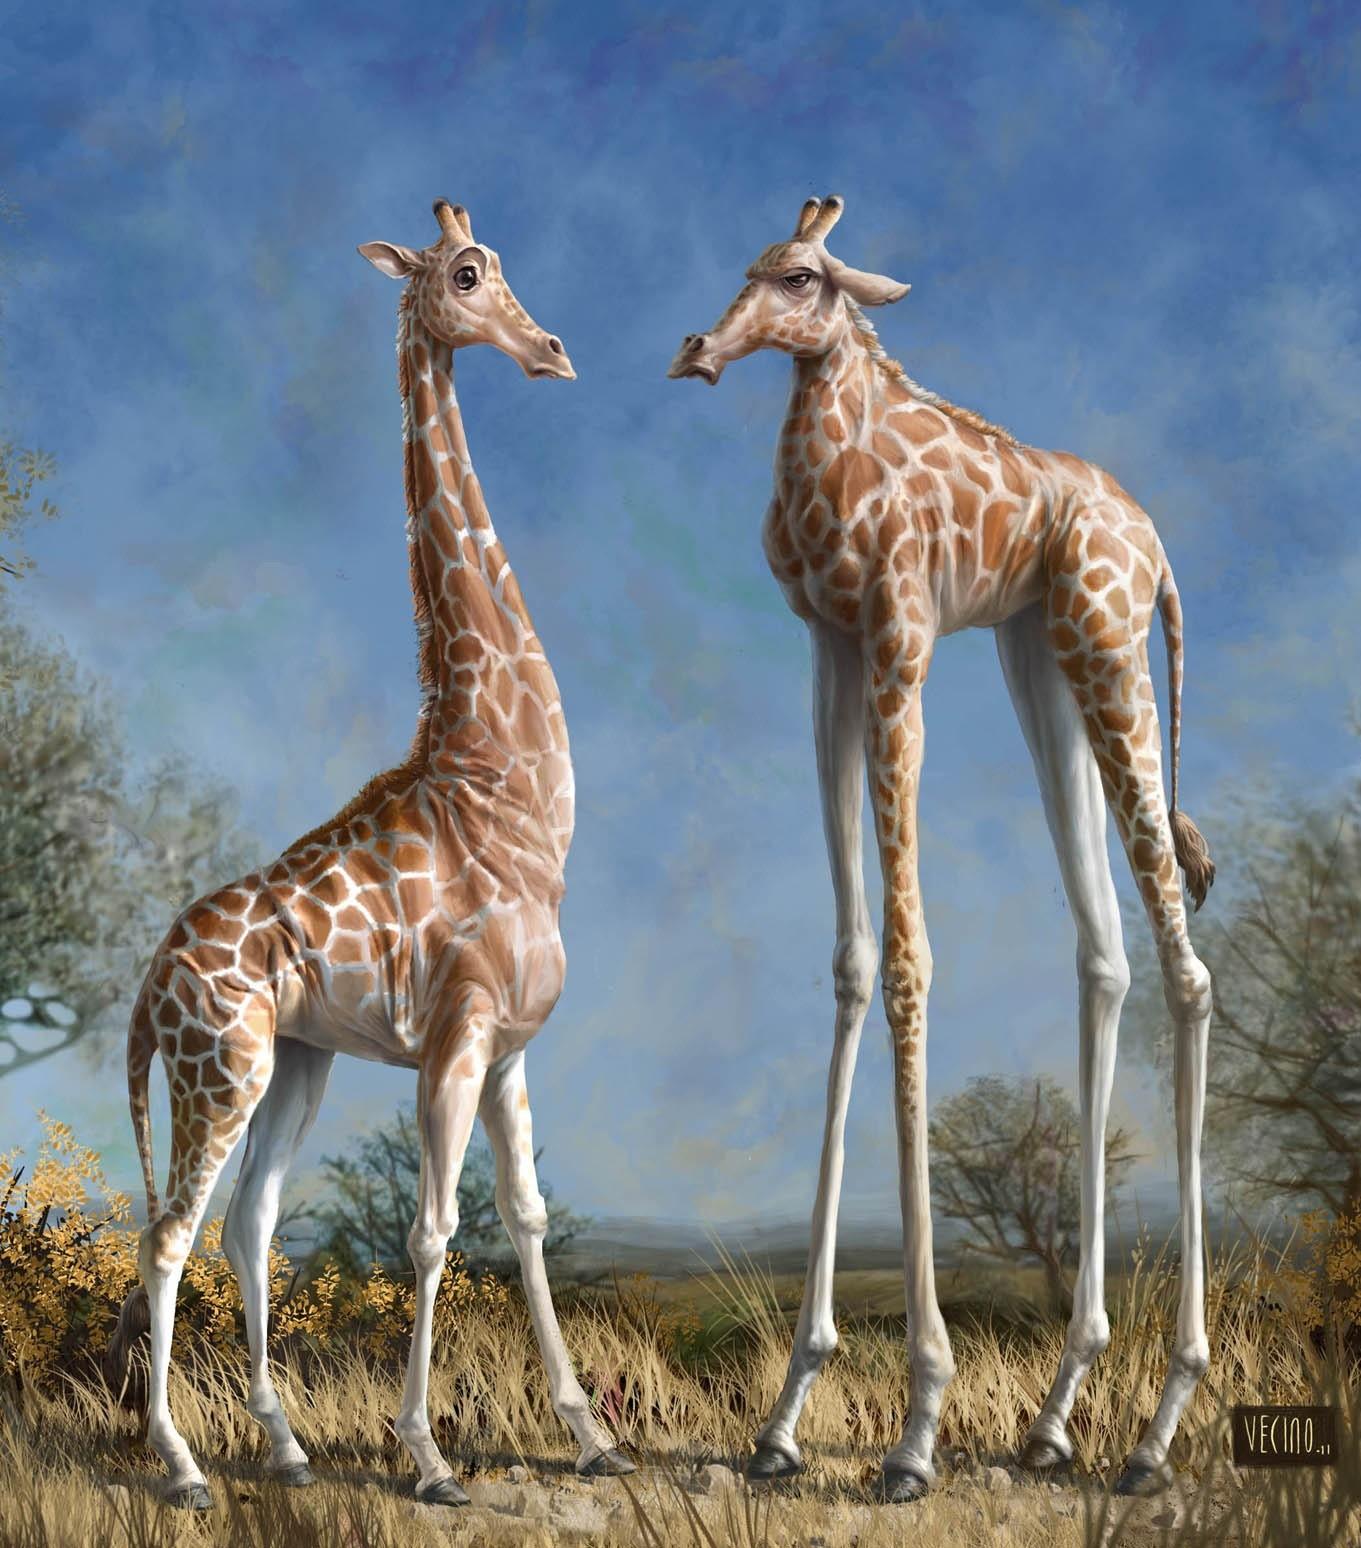 Fond D Ecran Girafes Faune Prairie Girafe Mammifere Vertebre Giraffidae Savane 1361x1548 Uberlost 119130 Fond D Ecran Wallhere